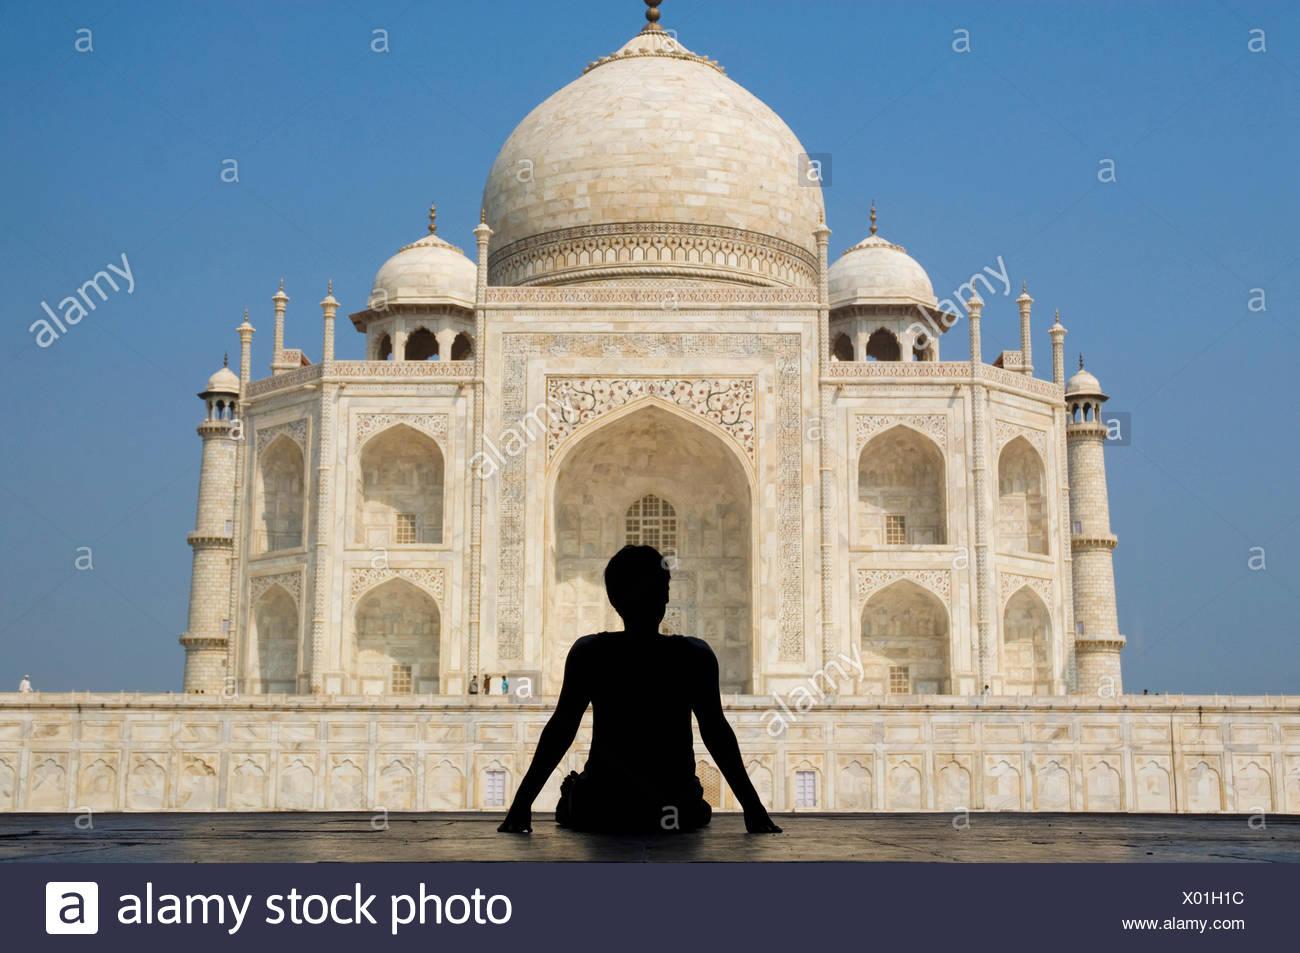 Silhouette Of Woman Admiring The Taj Mahal Rear View Stock